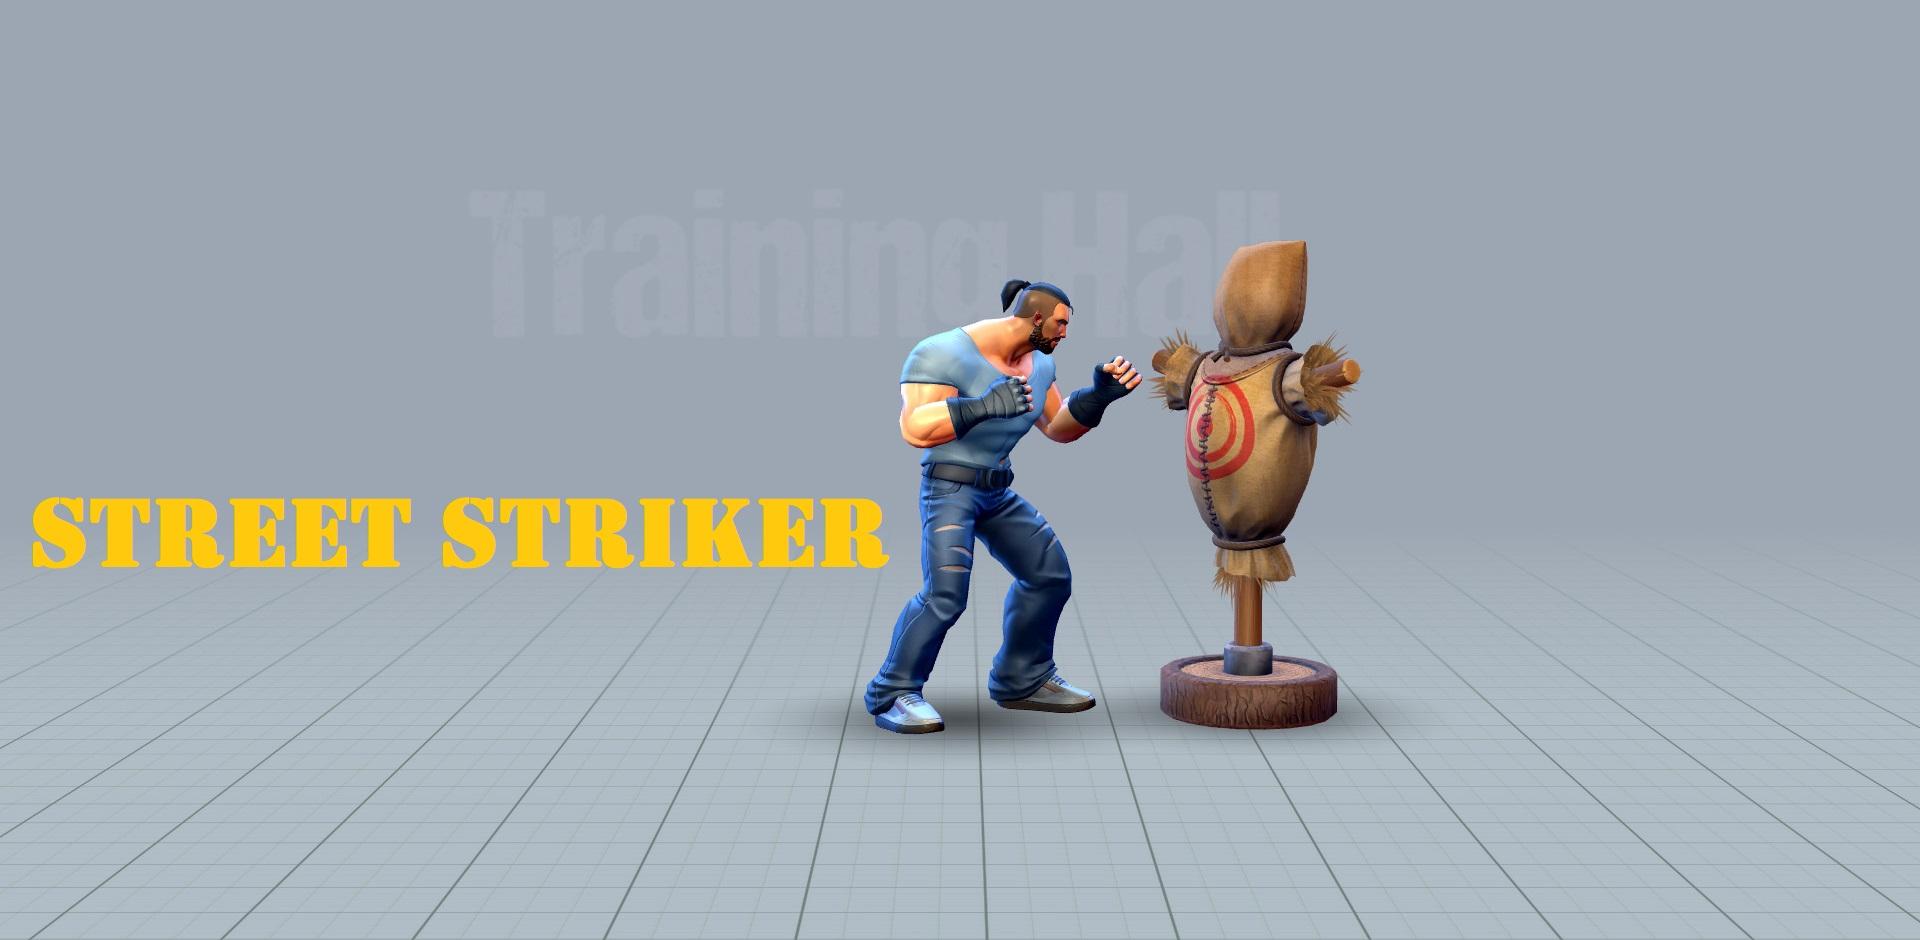 Street Striker Free Download